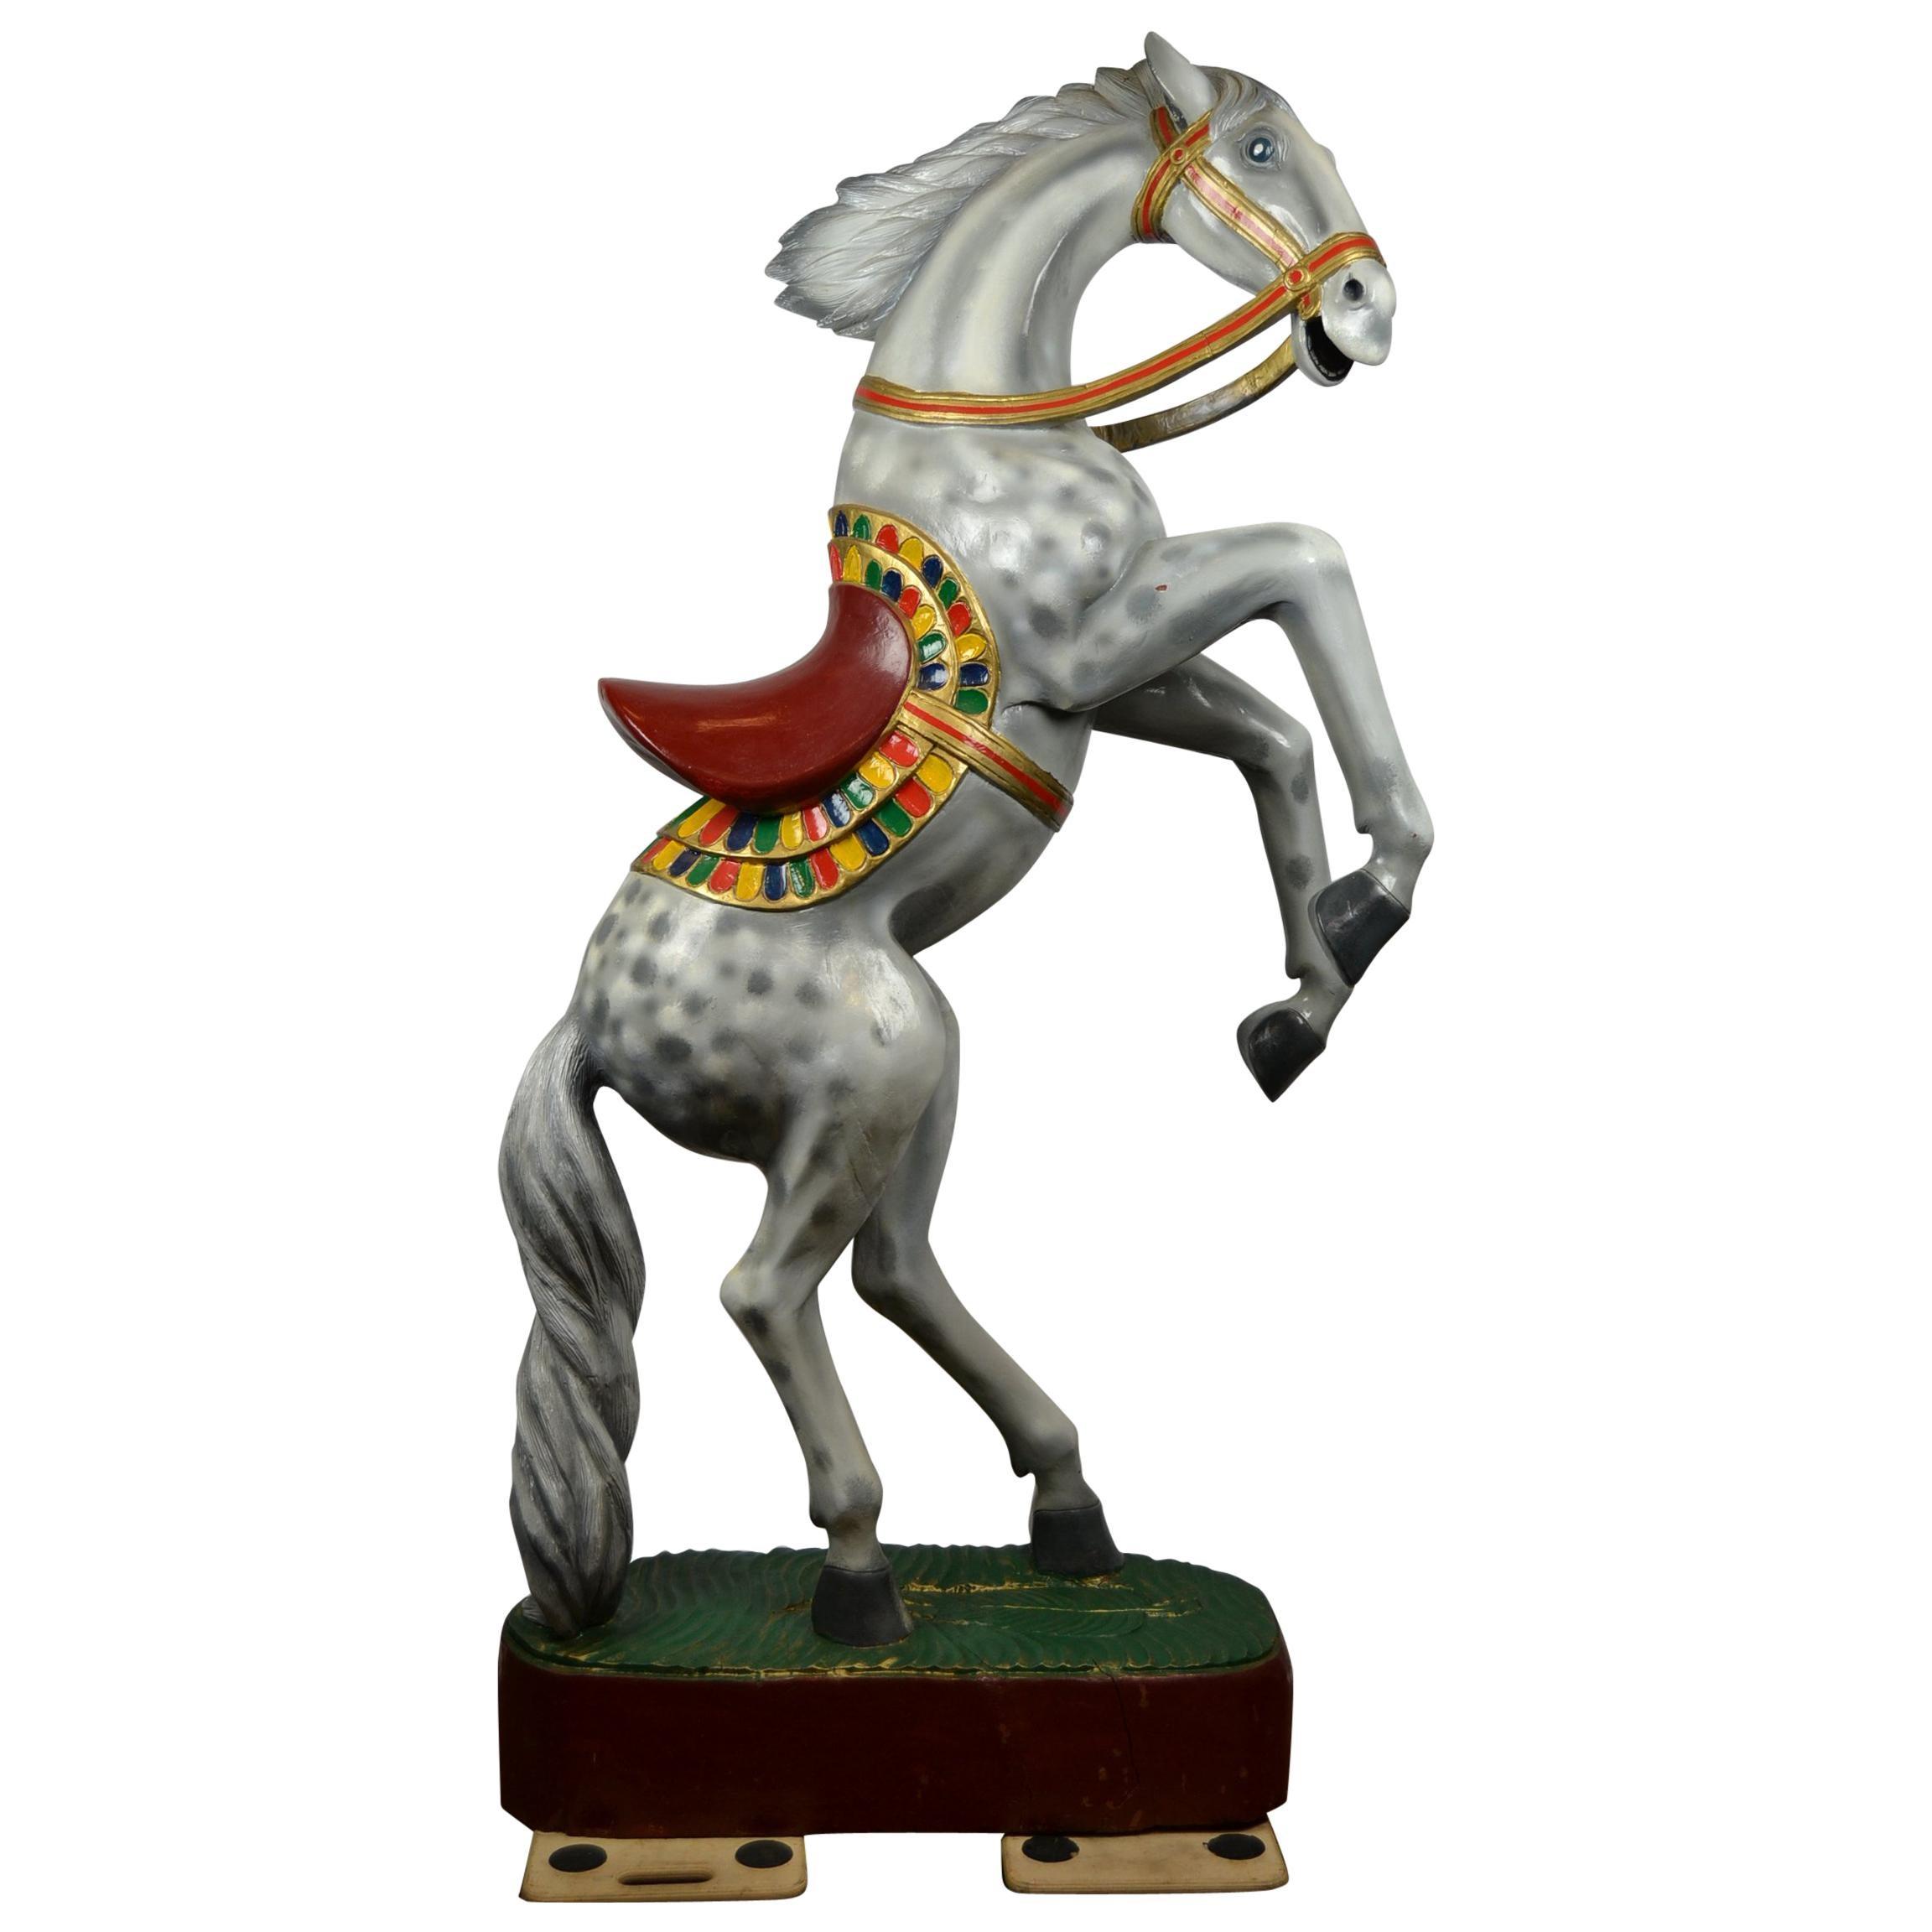 Giant Vintage Wooden Horse Sculpture, USA, 1950s